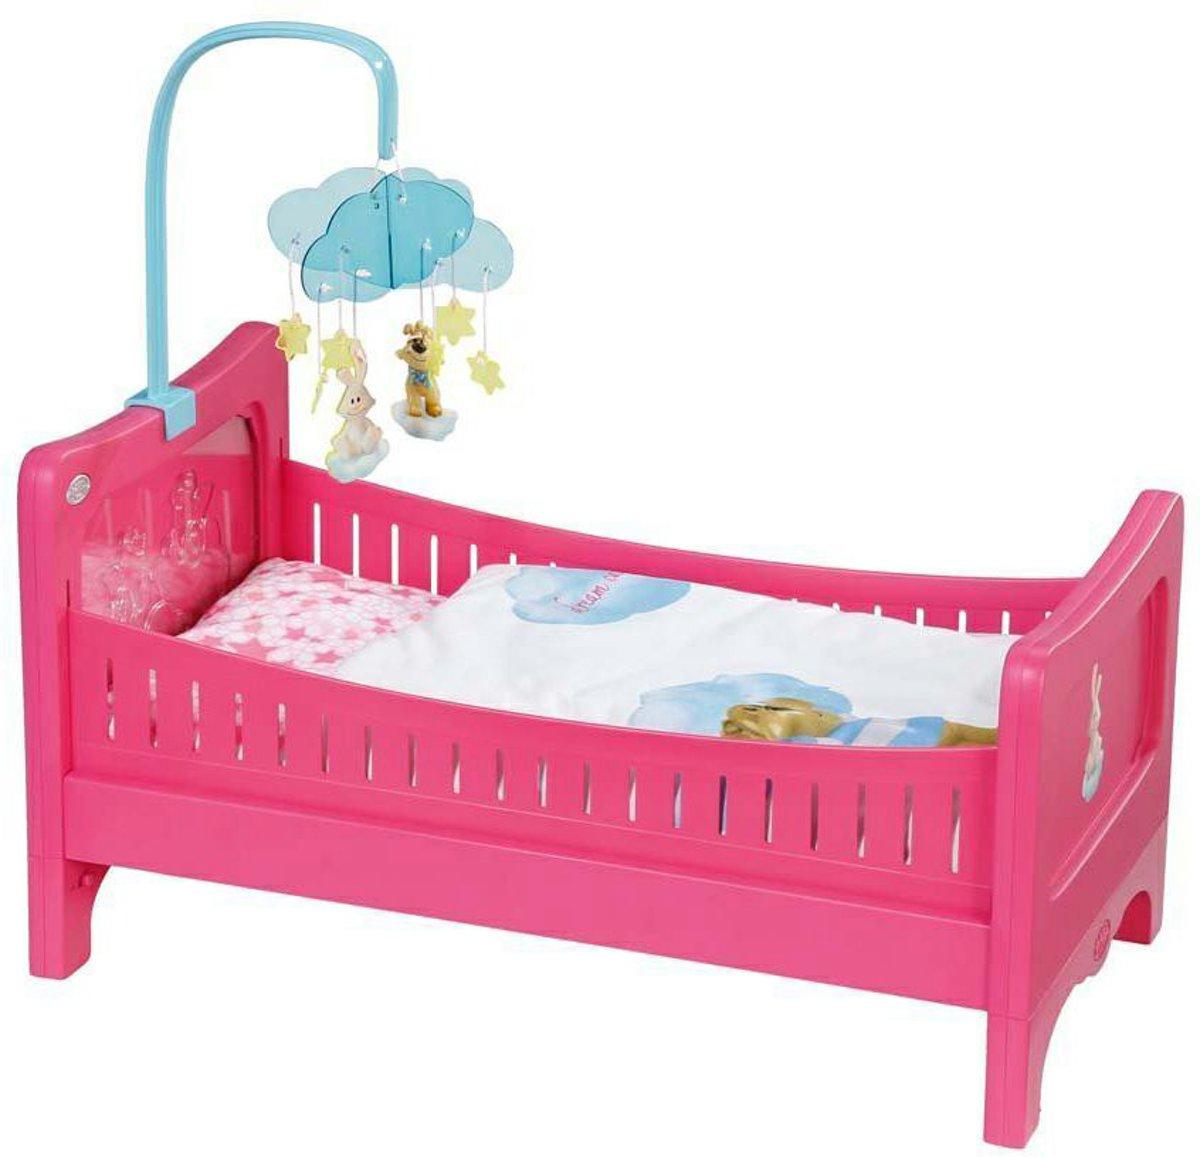 BABY born Bed